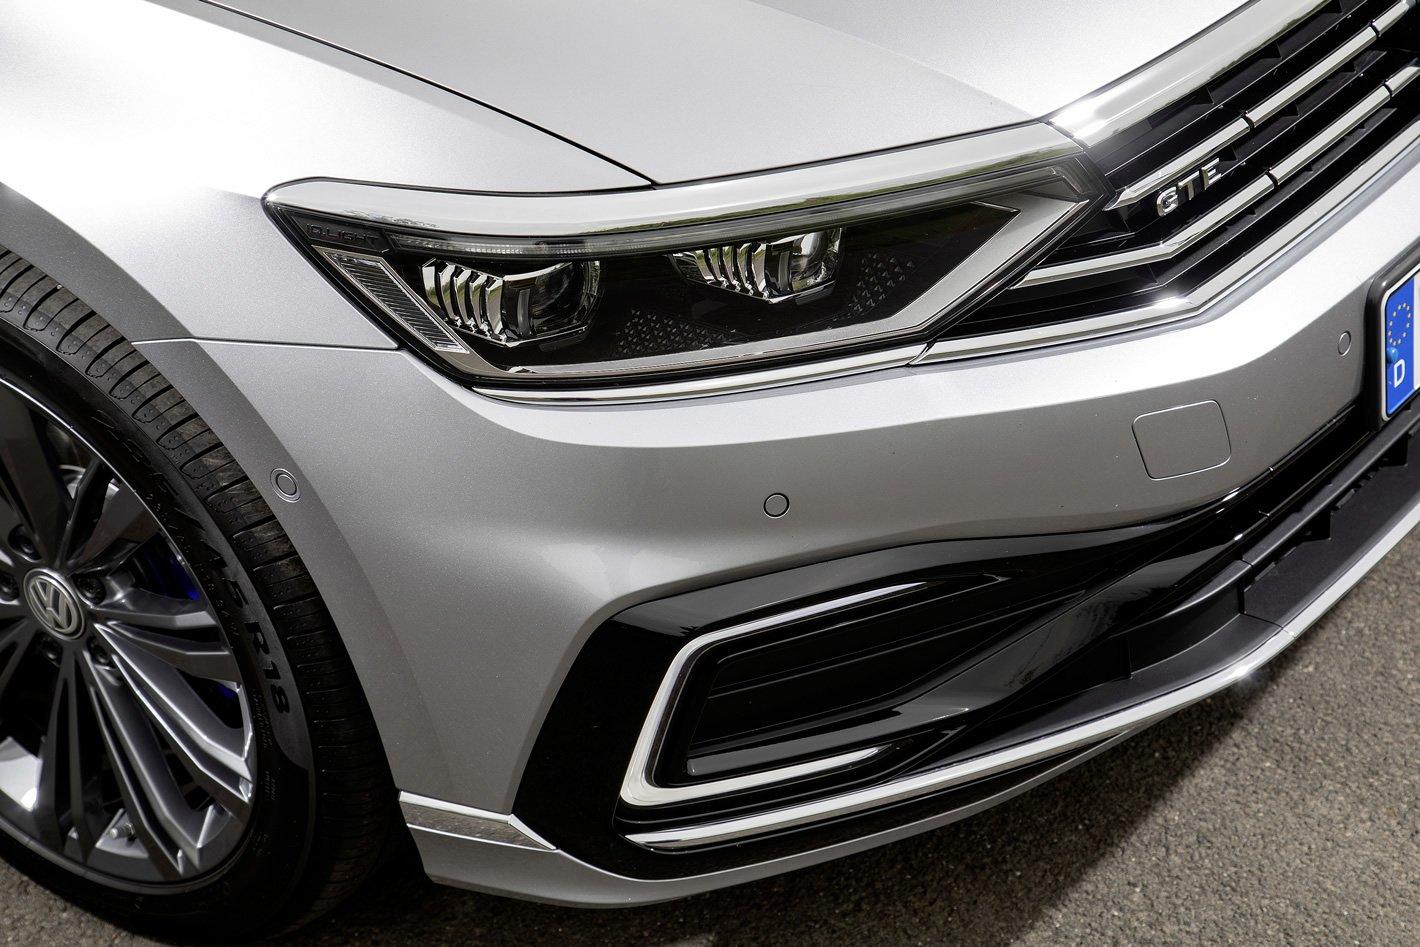 Nowy Volkswagen Passat - reflektory matrycowe